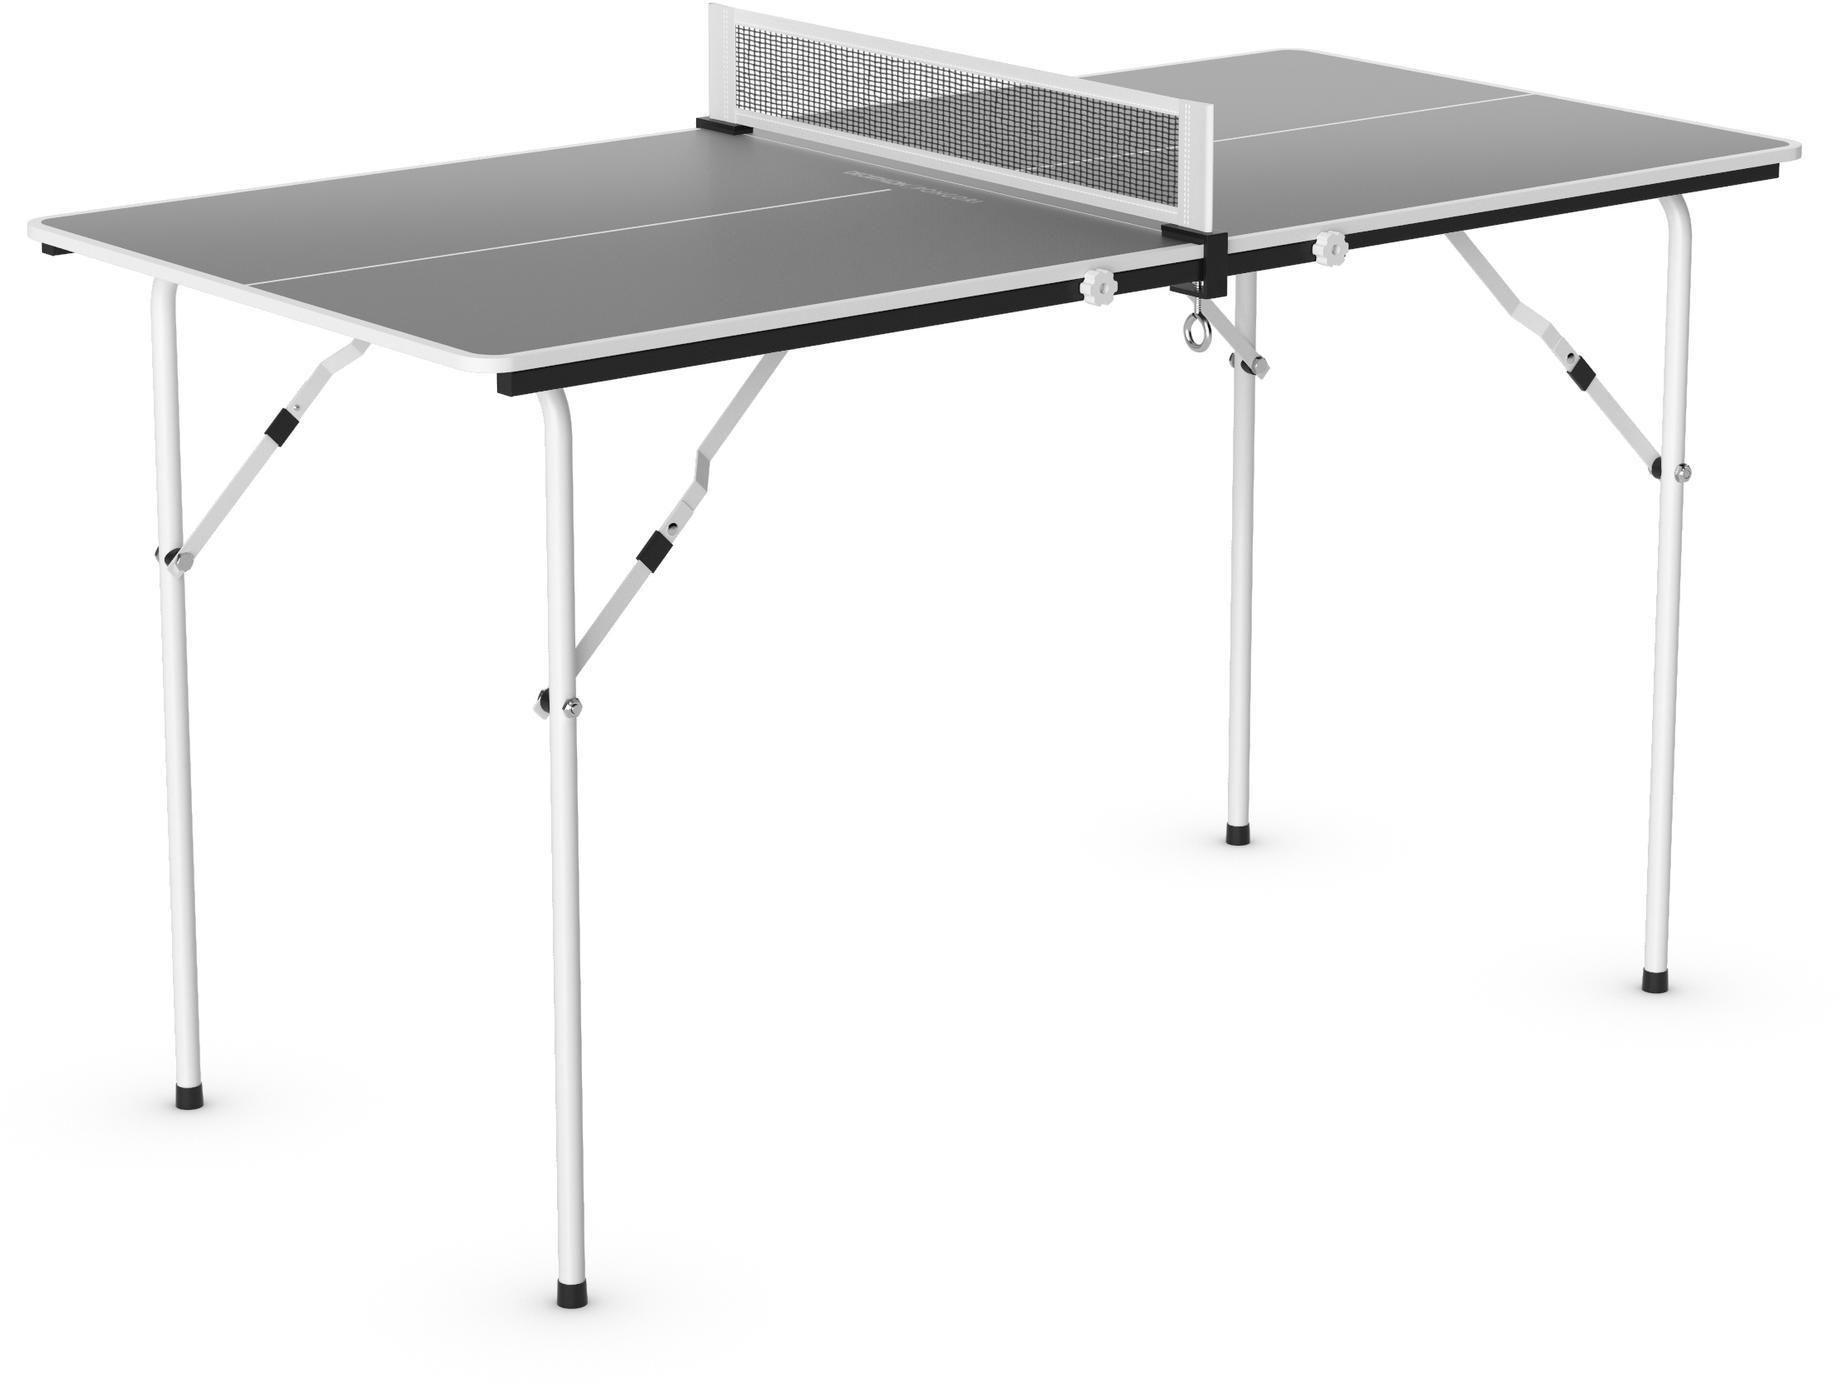 Stół do tenisa stołowego PPT 130 SMALL INDOOR